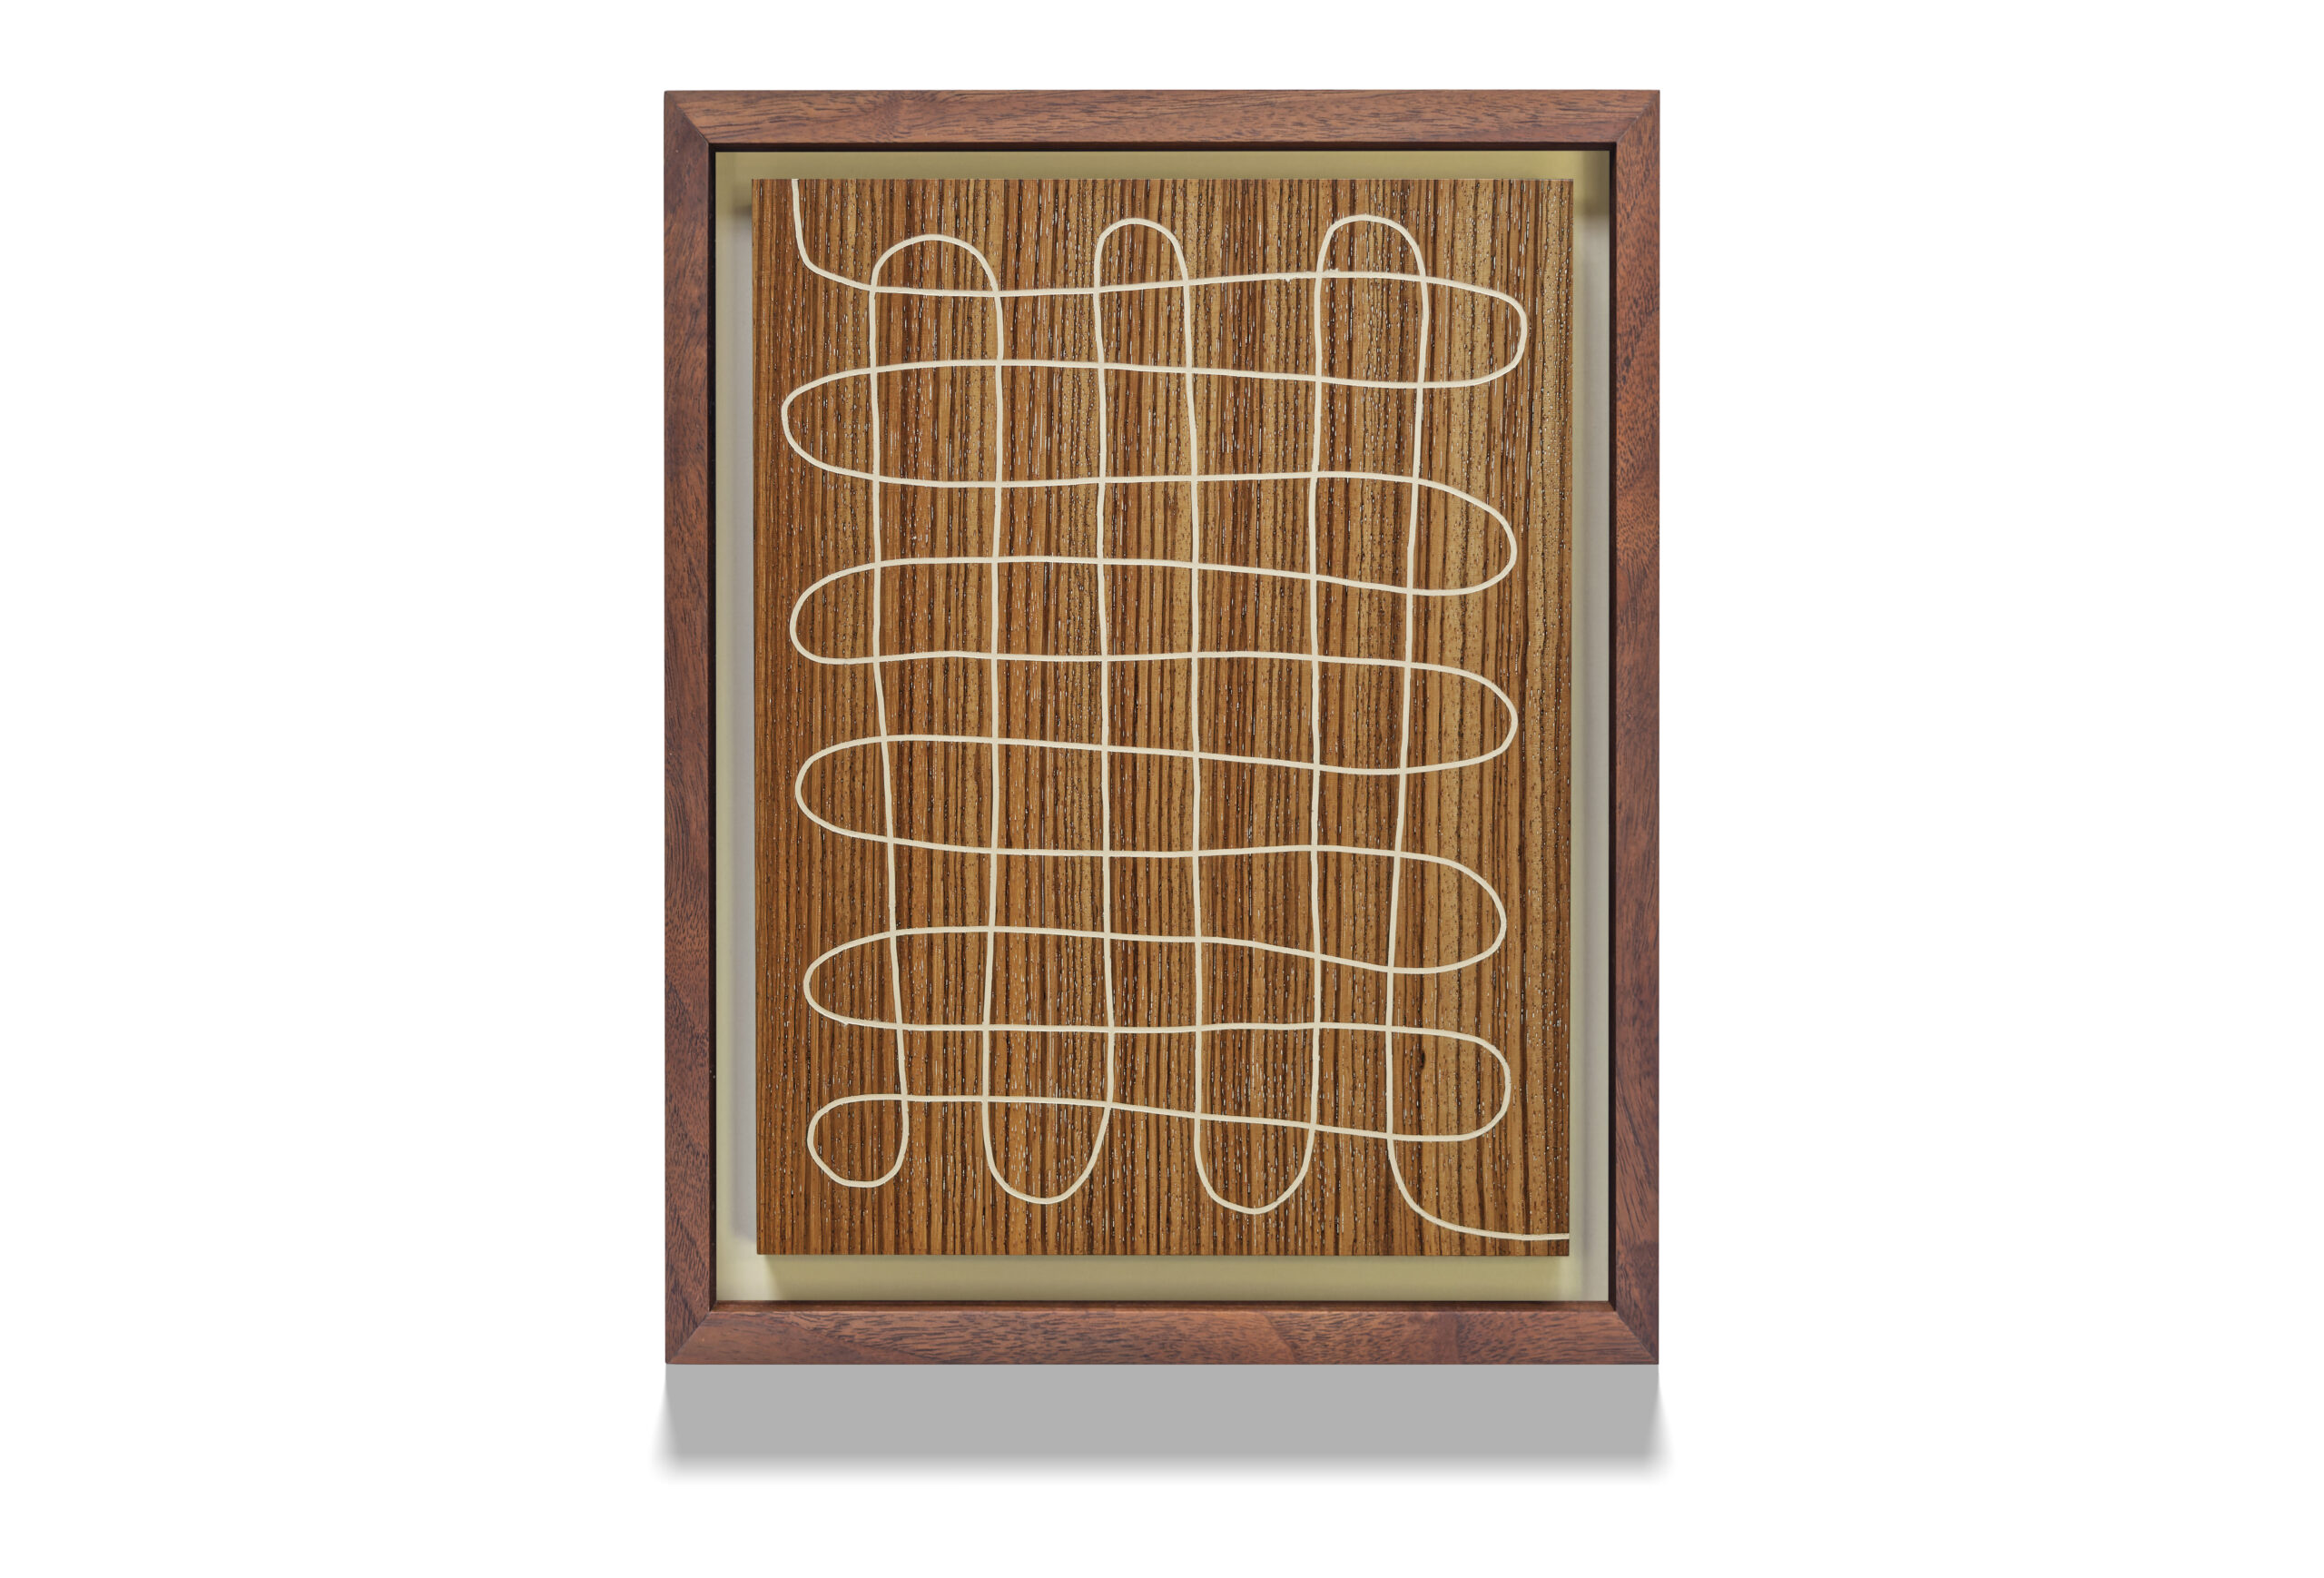 Snaky Zebra wood drawing